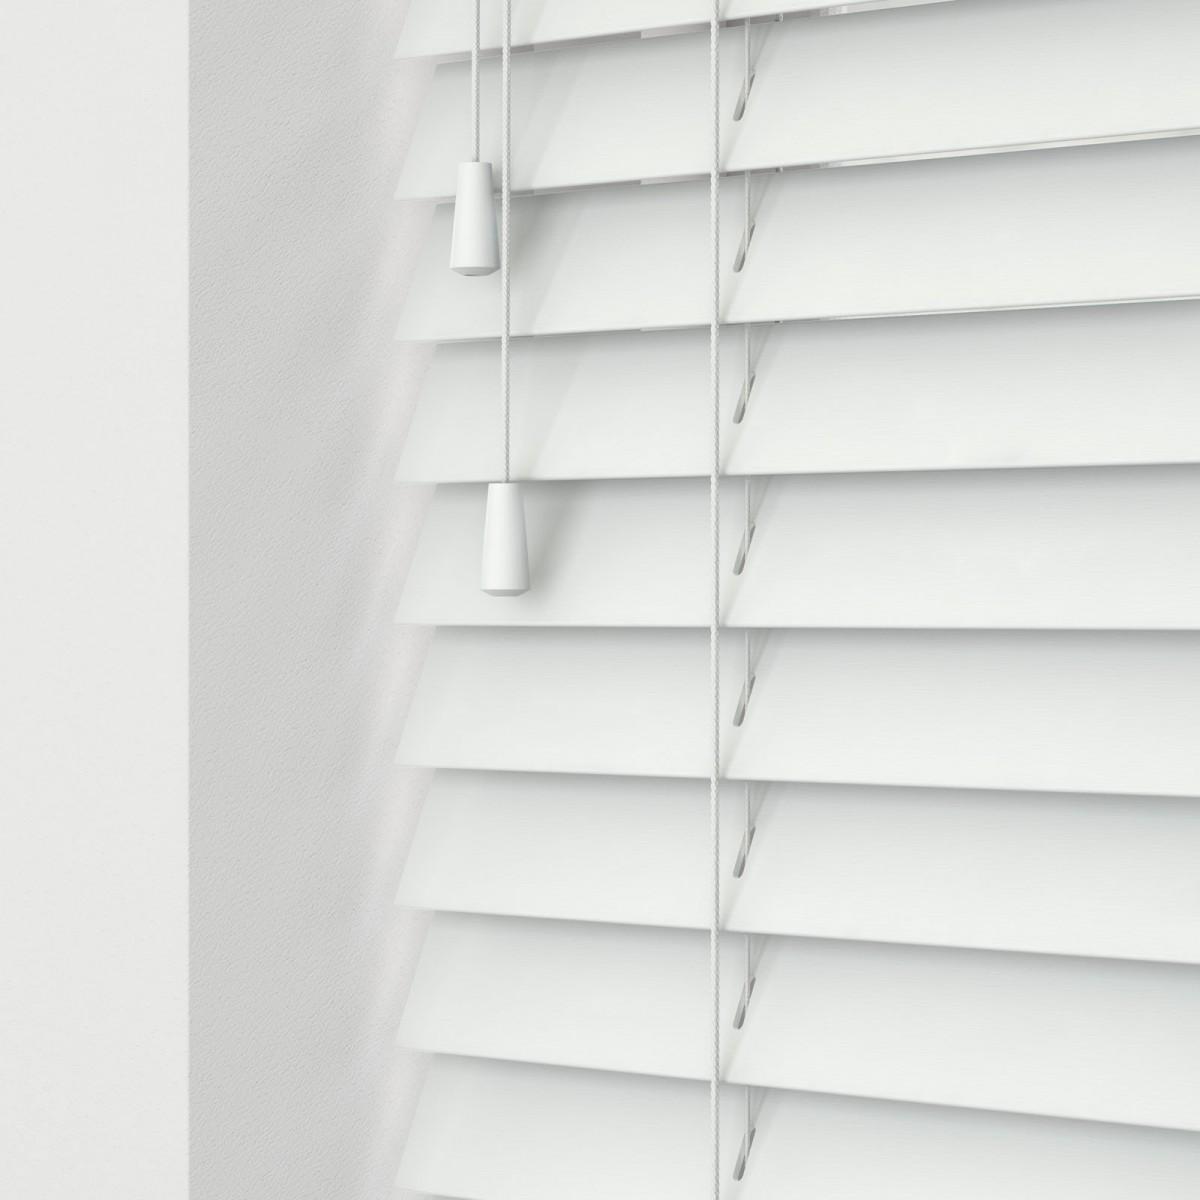 25mm Decora Wooden Venetian Blind